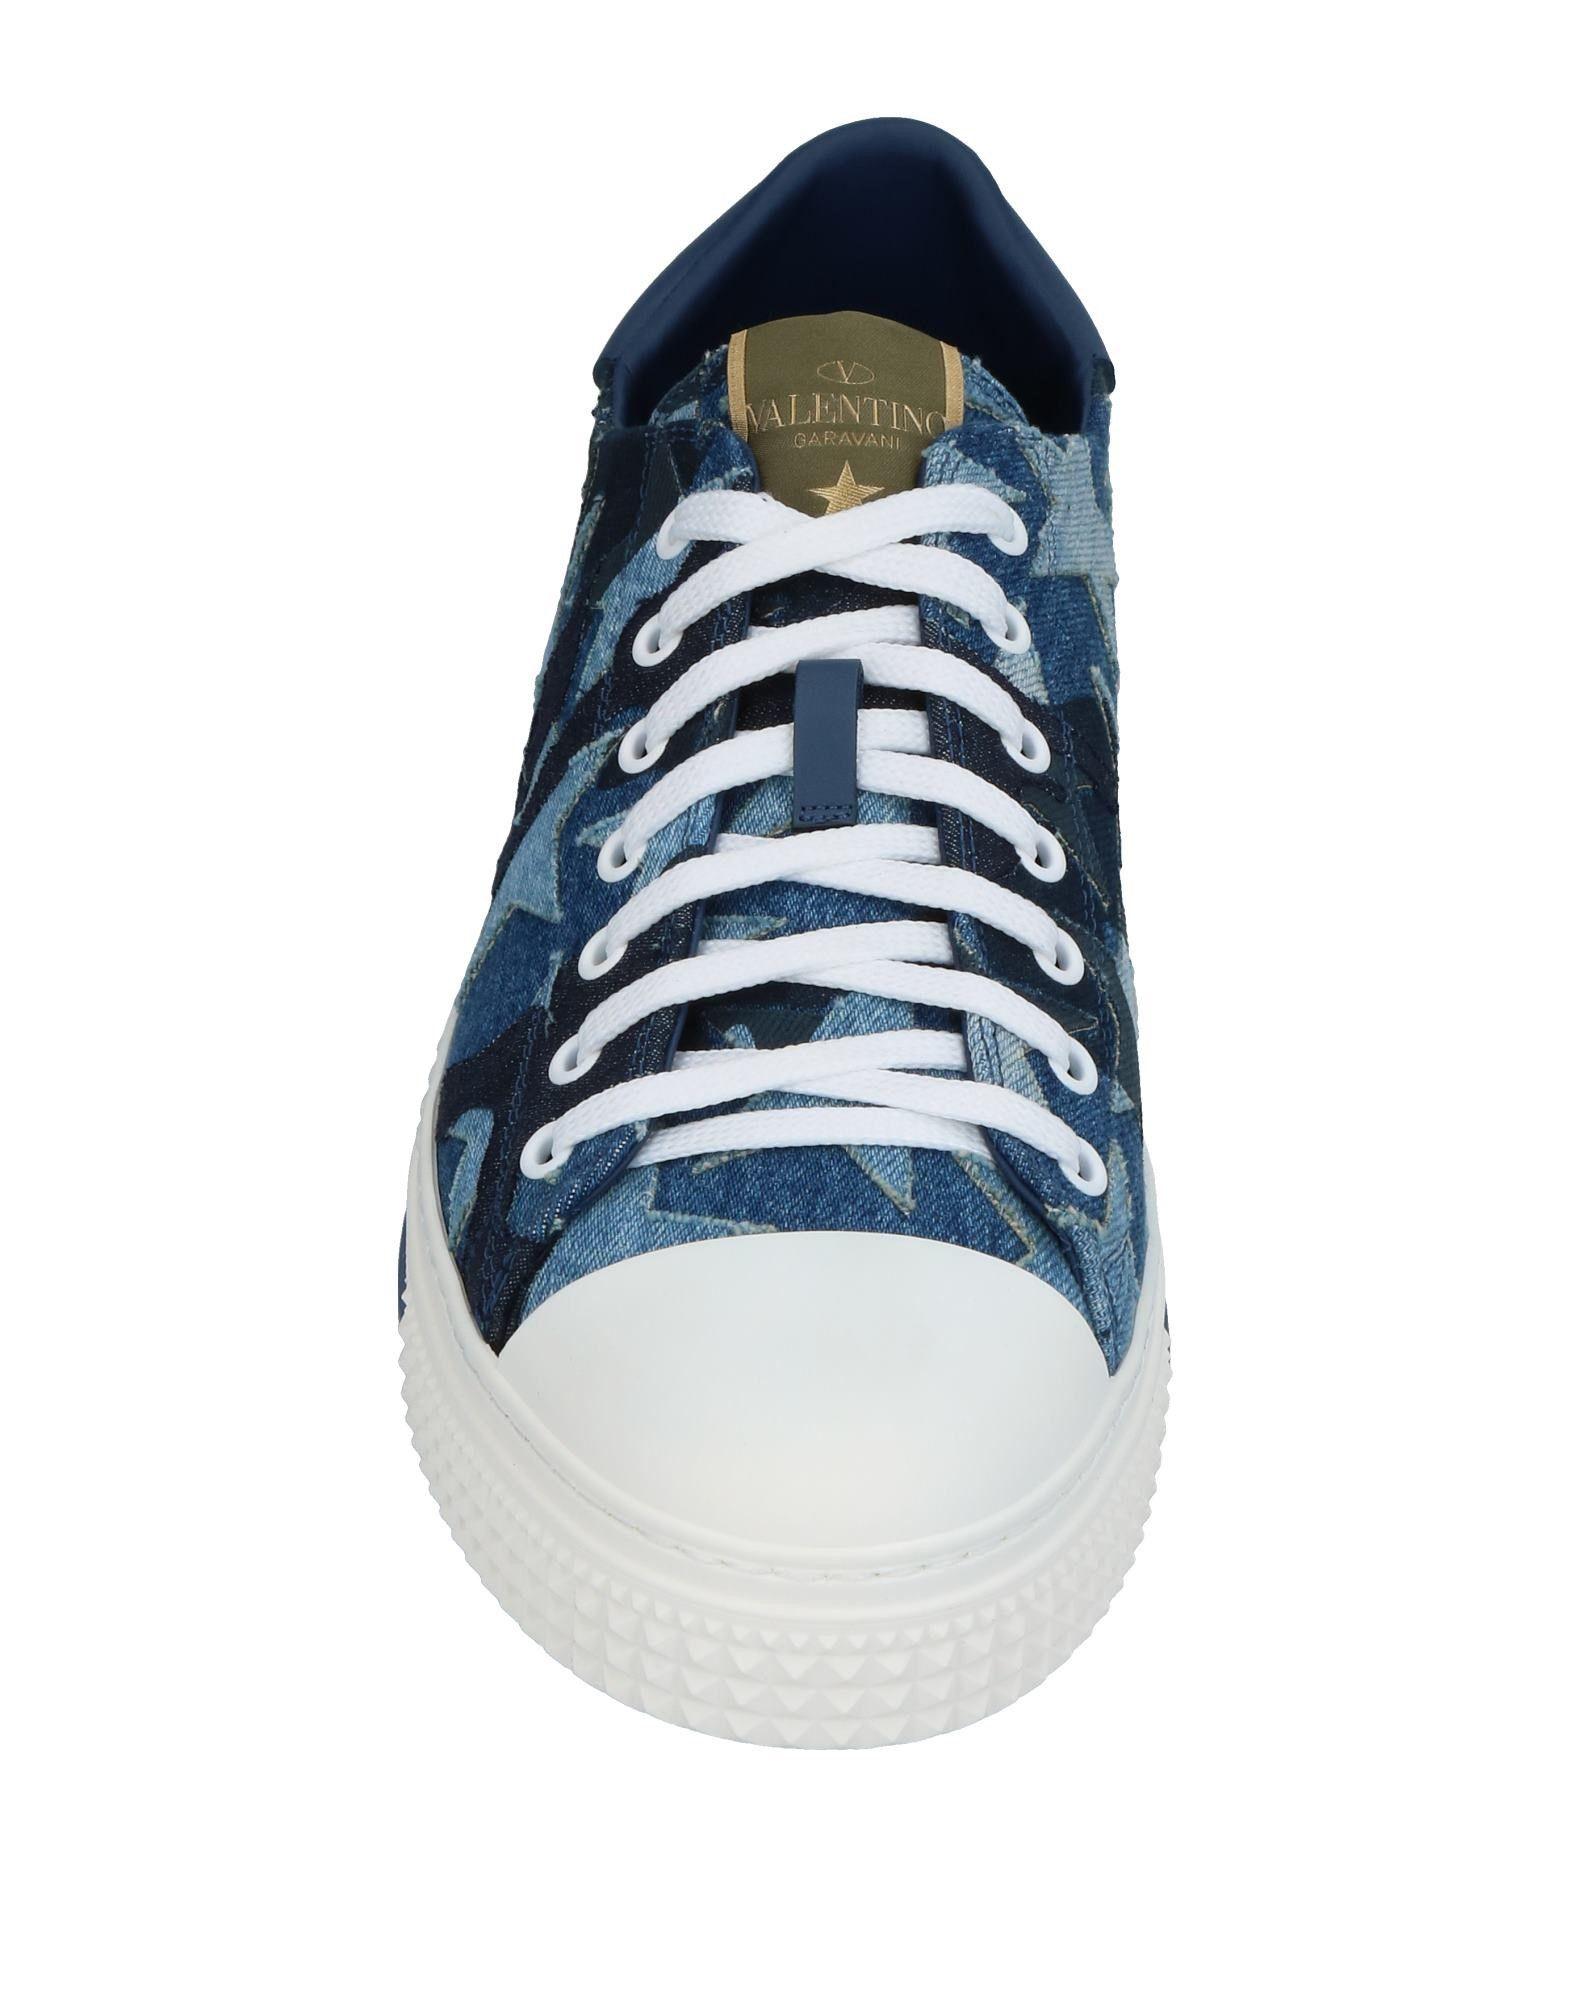 Valentino Garavani Sneakers Herren  11404257EL Gute Qualität beliebte Schuhe